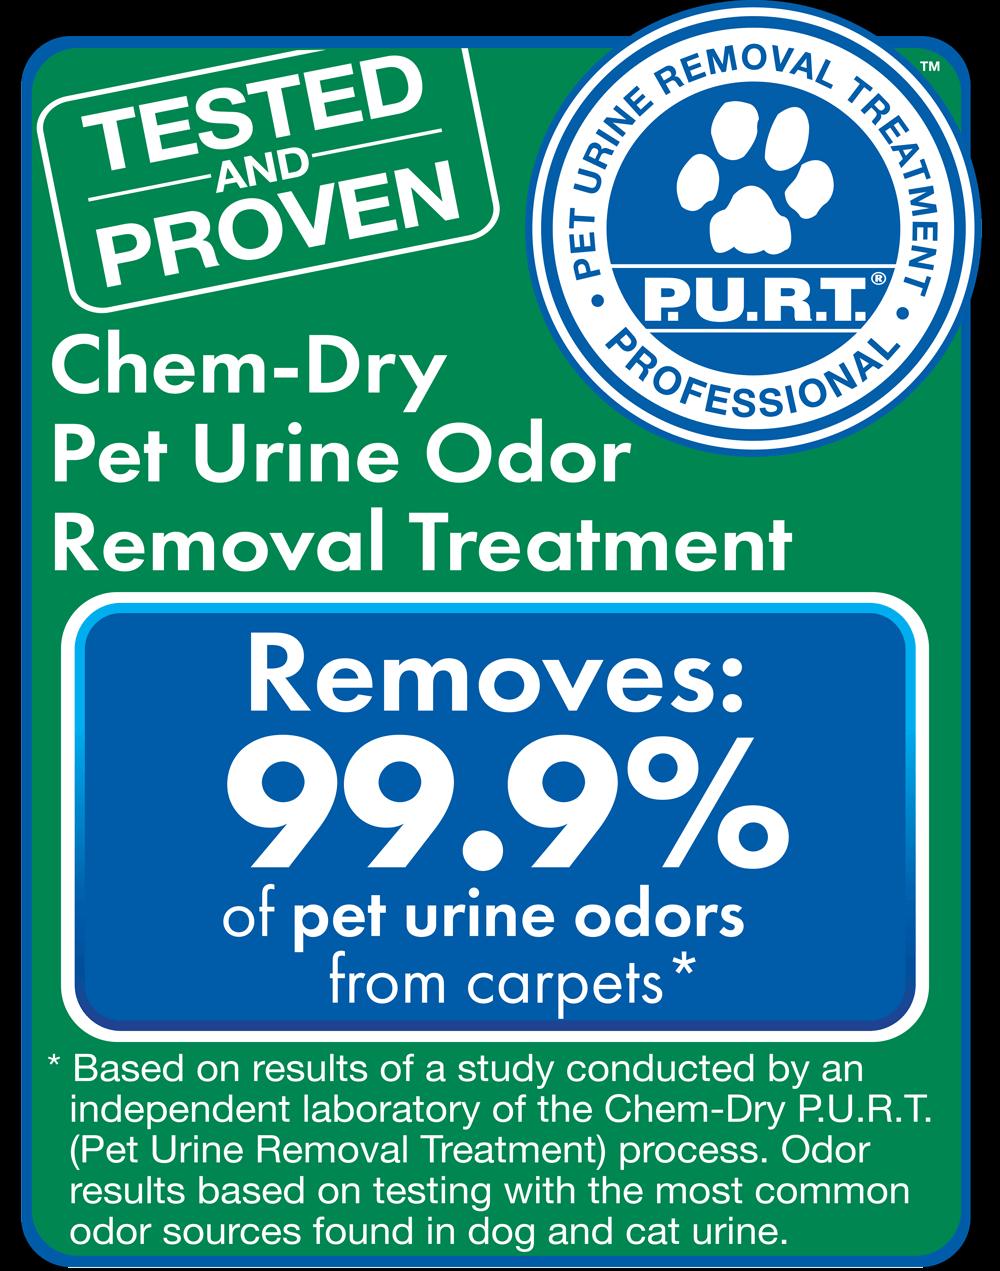 Chem-Dry-Pet-Urine-Removal-Study